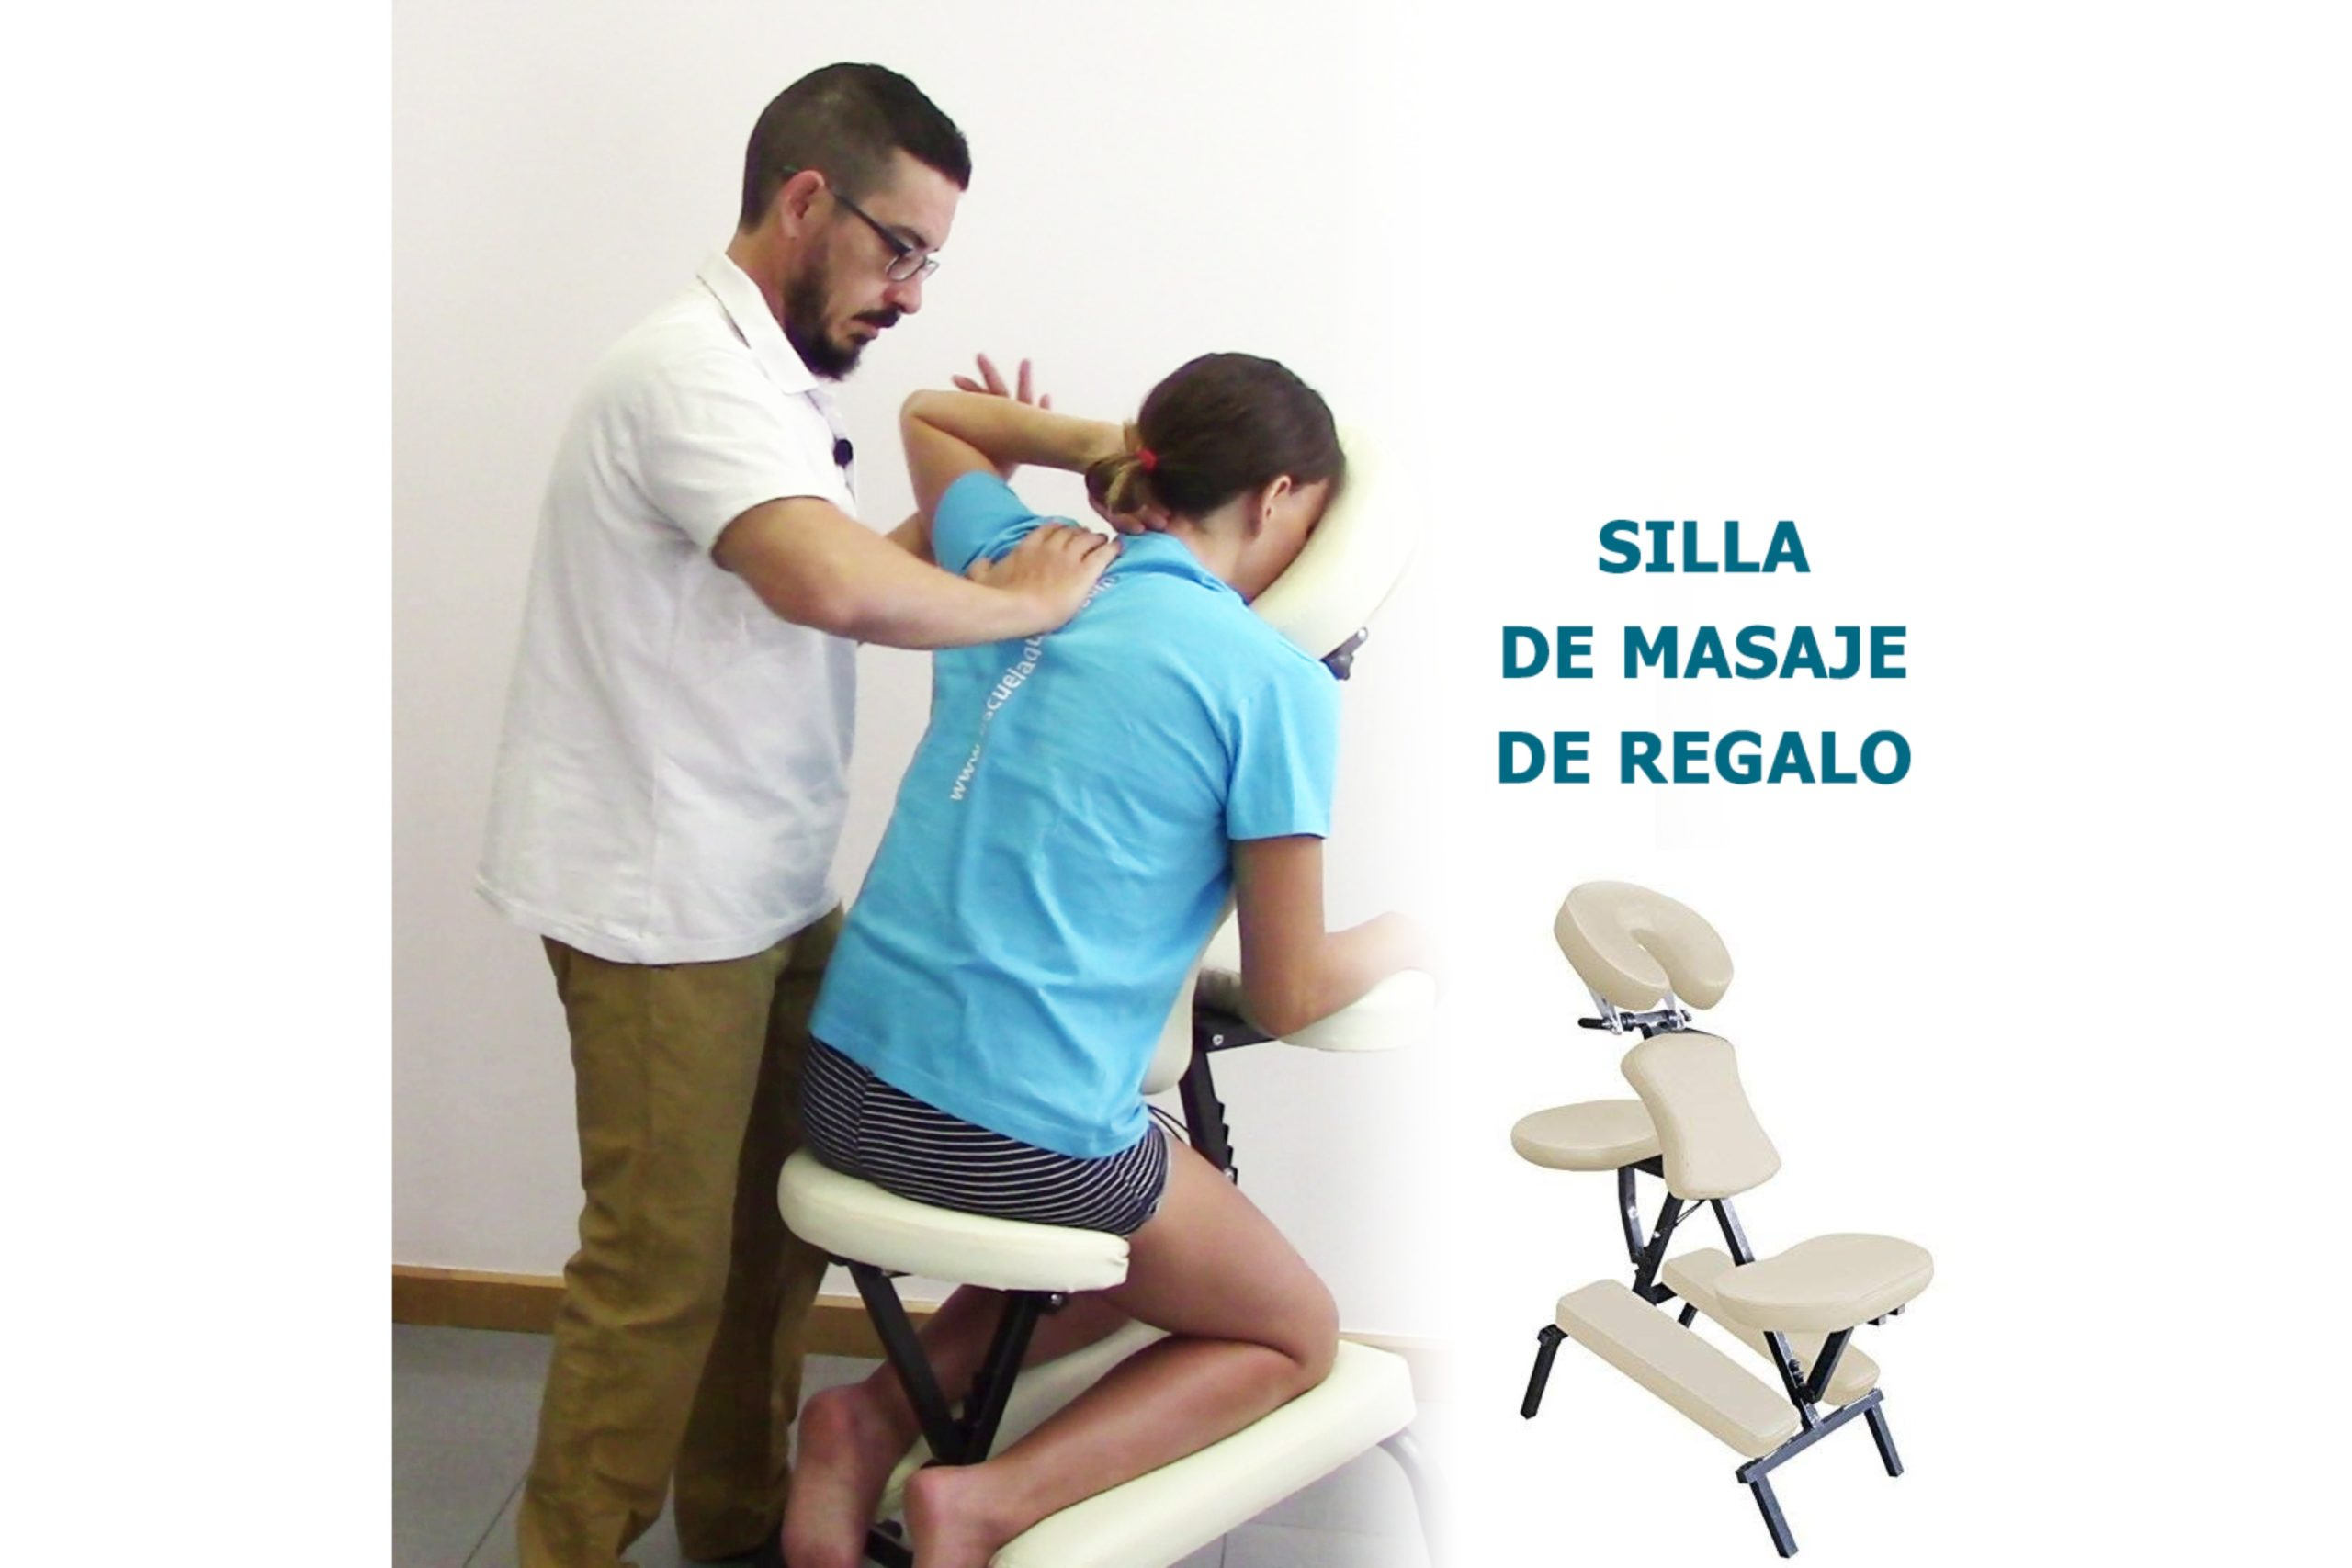 portada-SILLA-MASAJE-resized